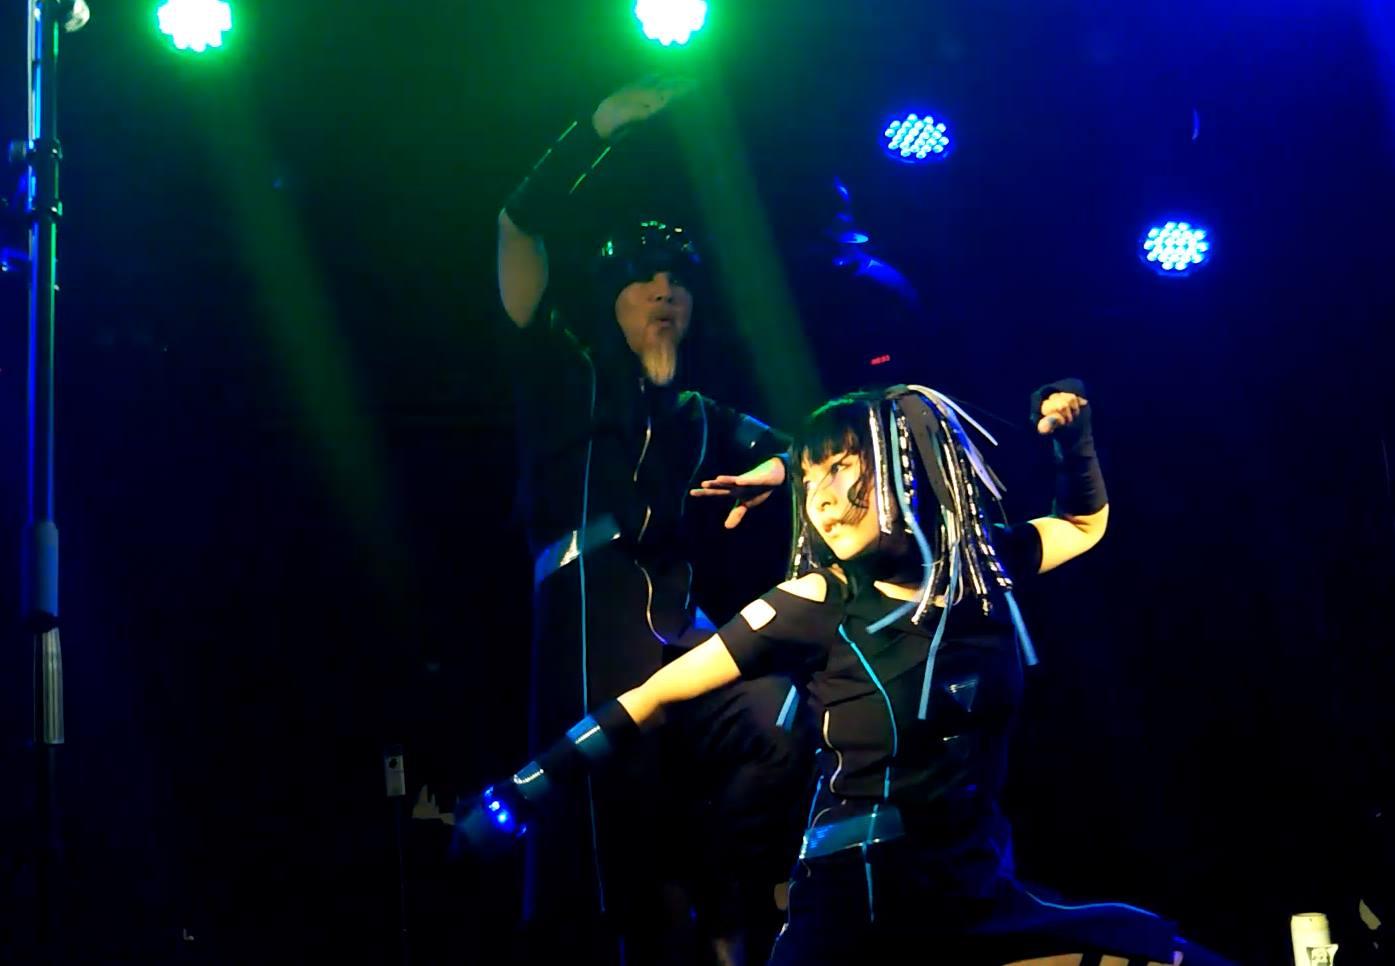 NekoPOP-Bespa-Kumamero-16th-Anniversary-Live-2017-03-18-A